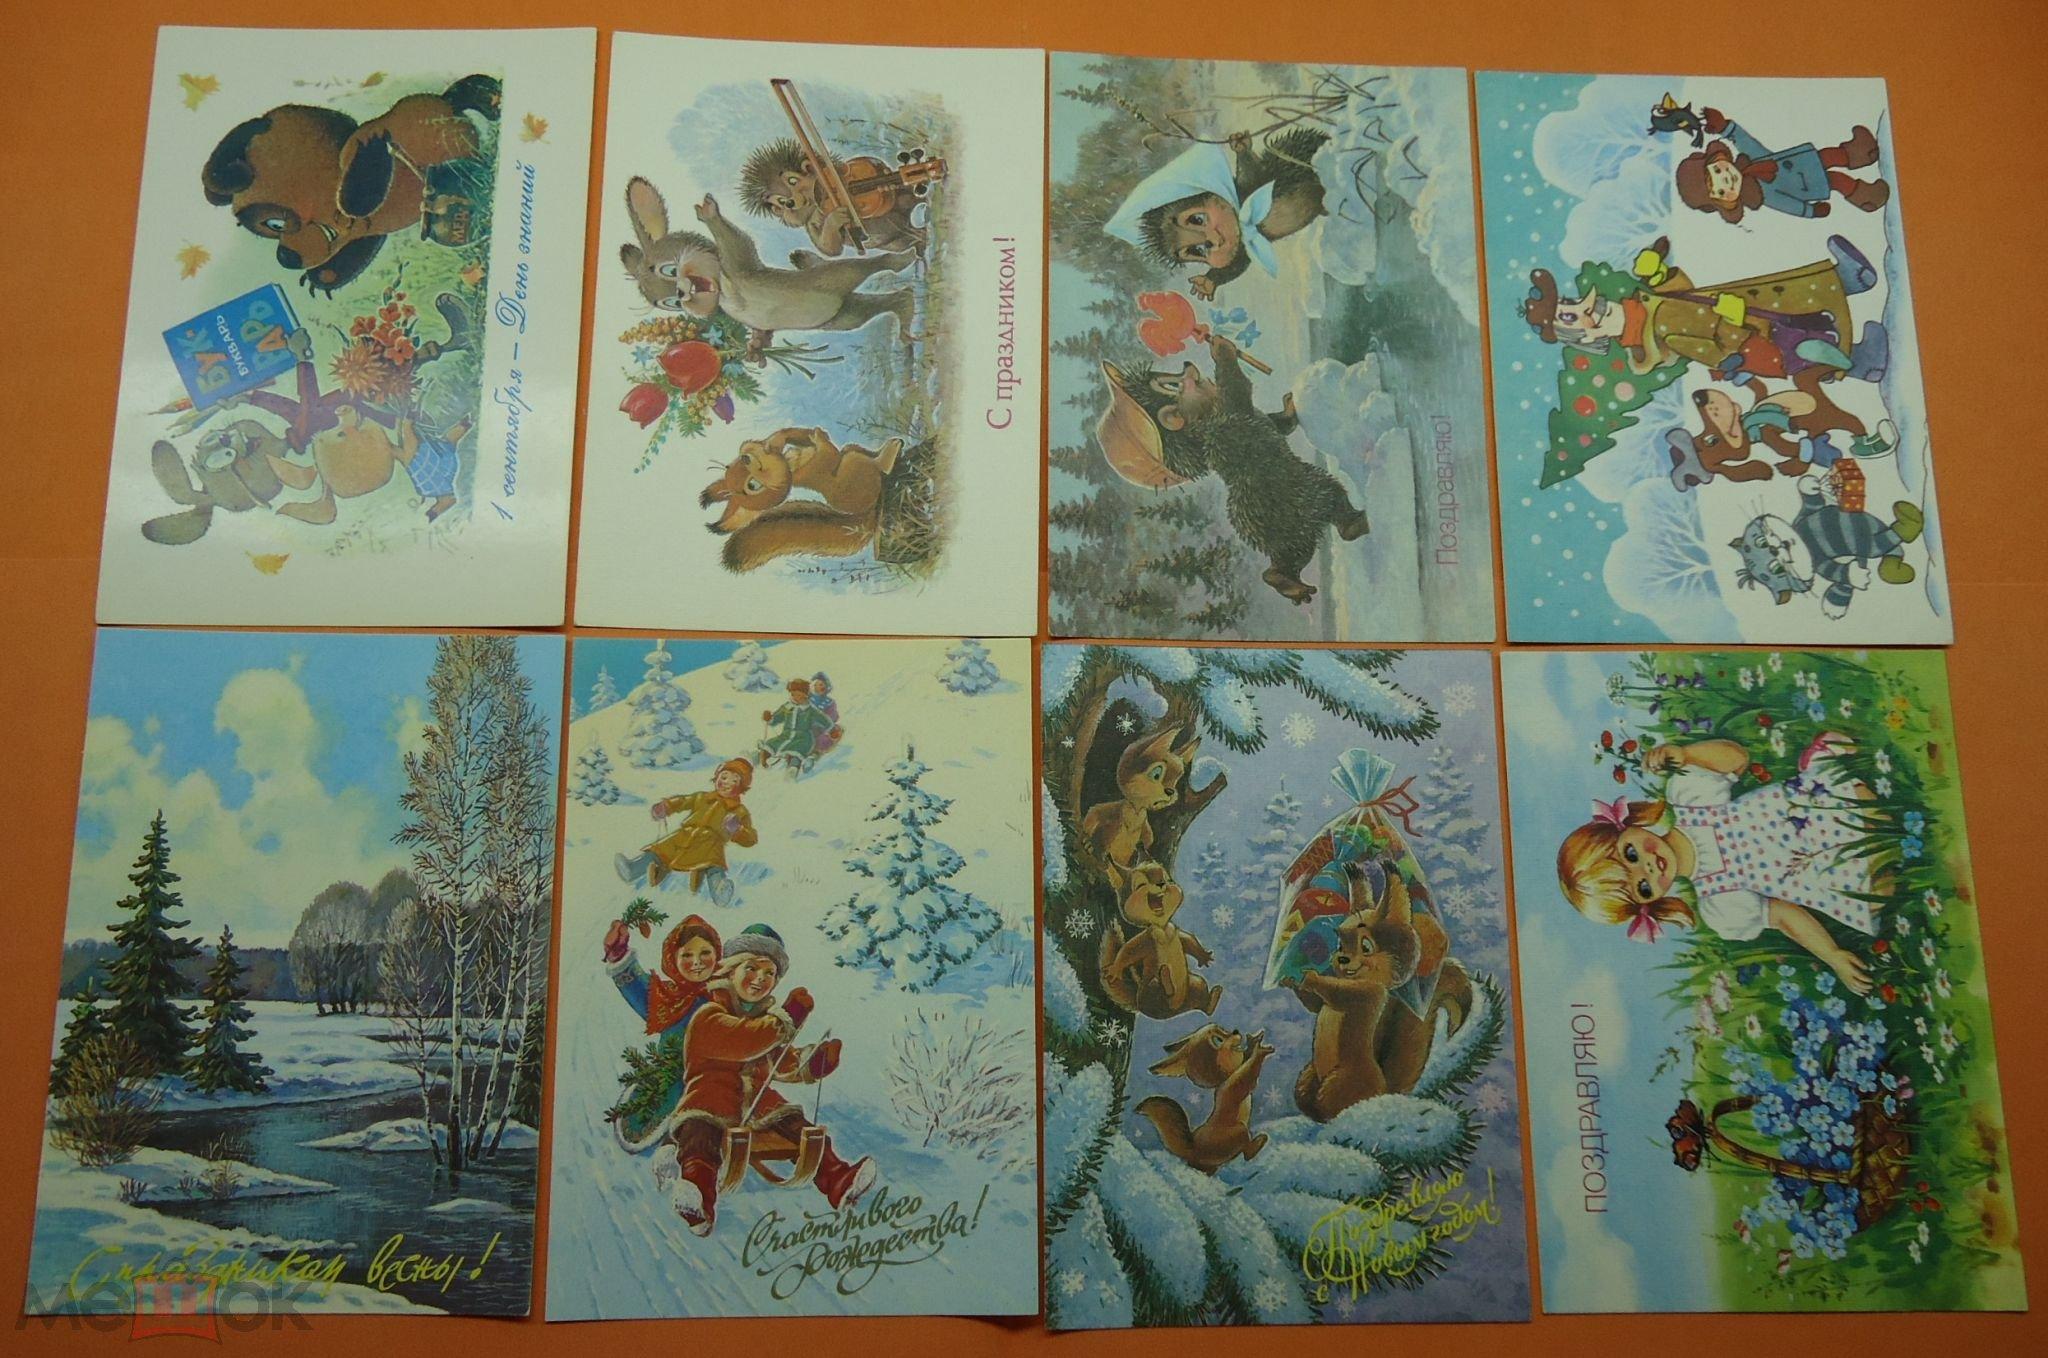 Поросенок картинки, зарубин все открытки каталог